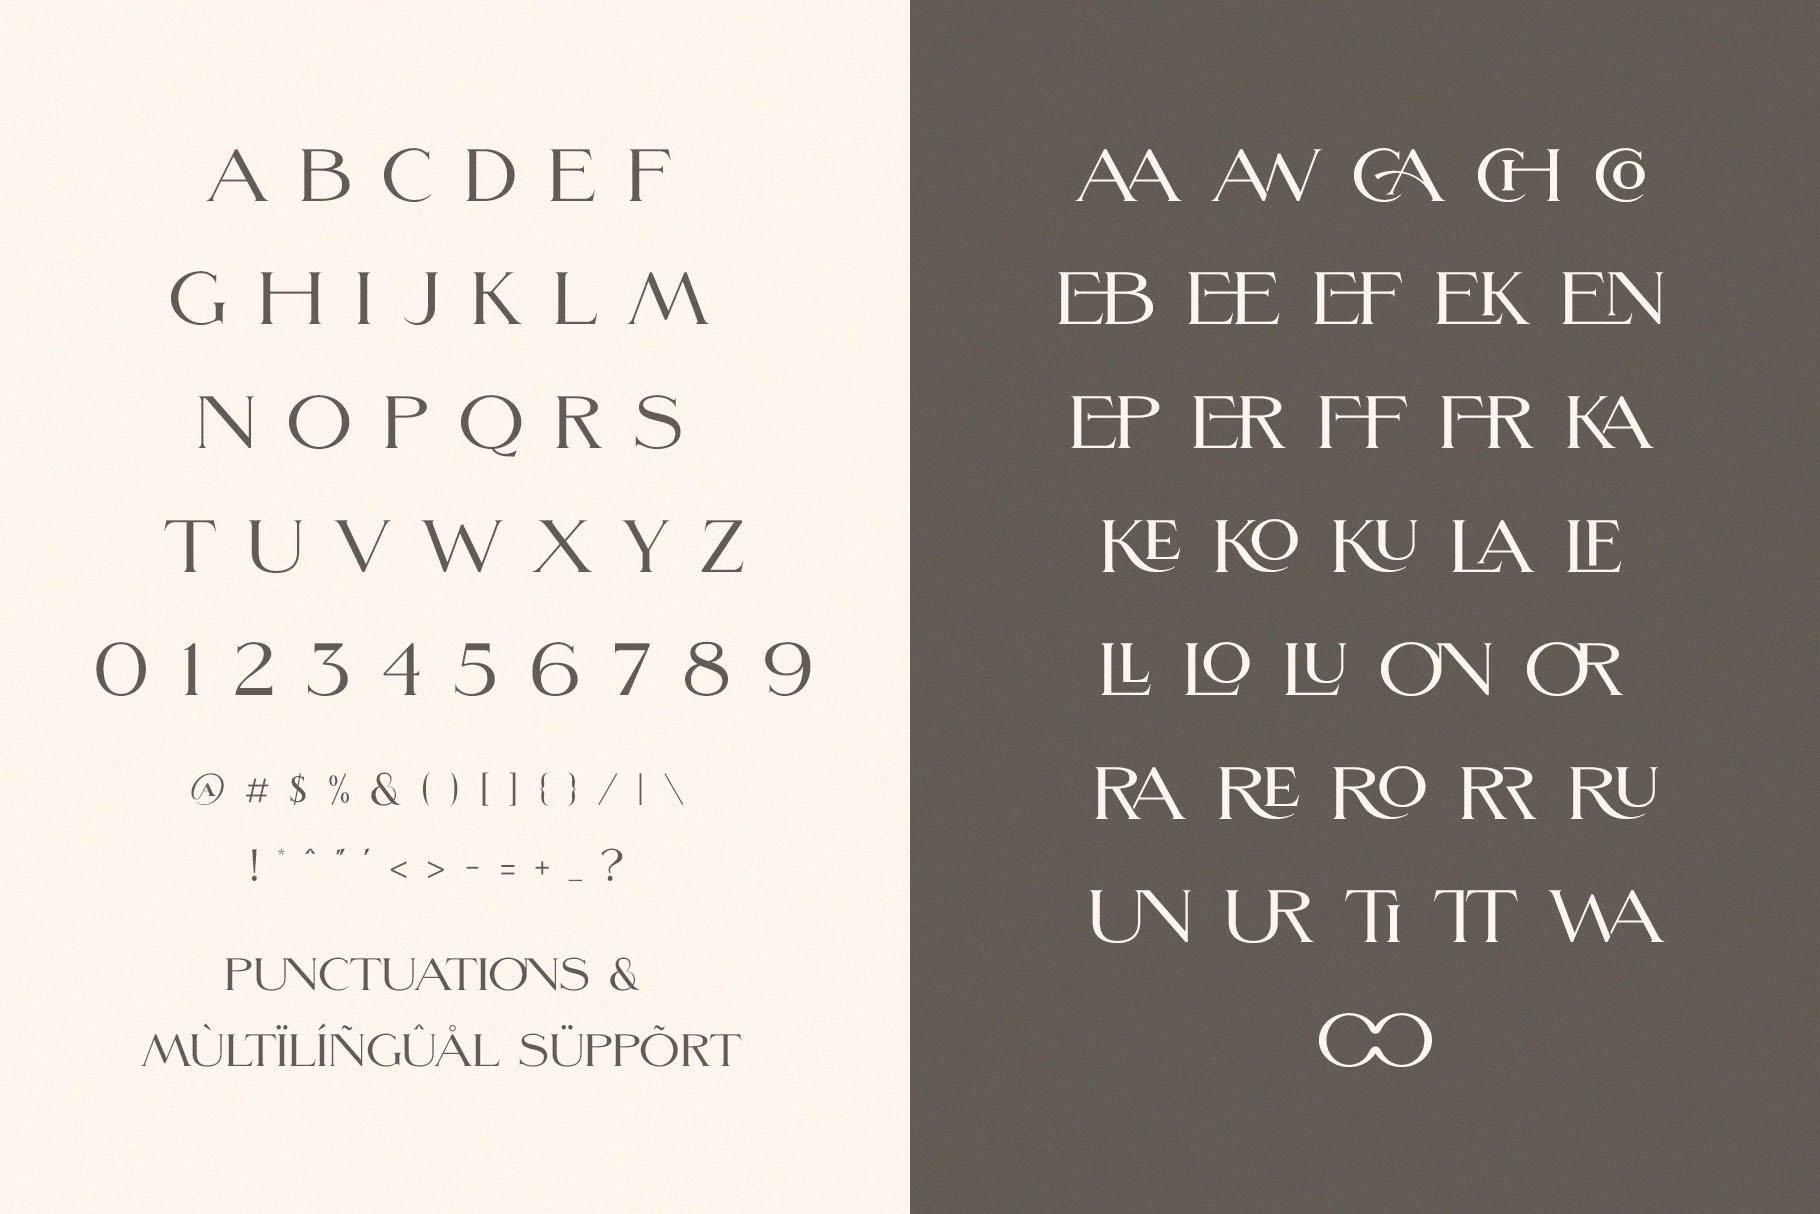 ligatures ligature font minimalist font display font classy font elegant font serif wedding font modern font logo font fashion social media modern serif 9 11